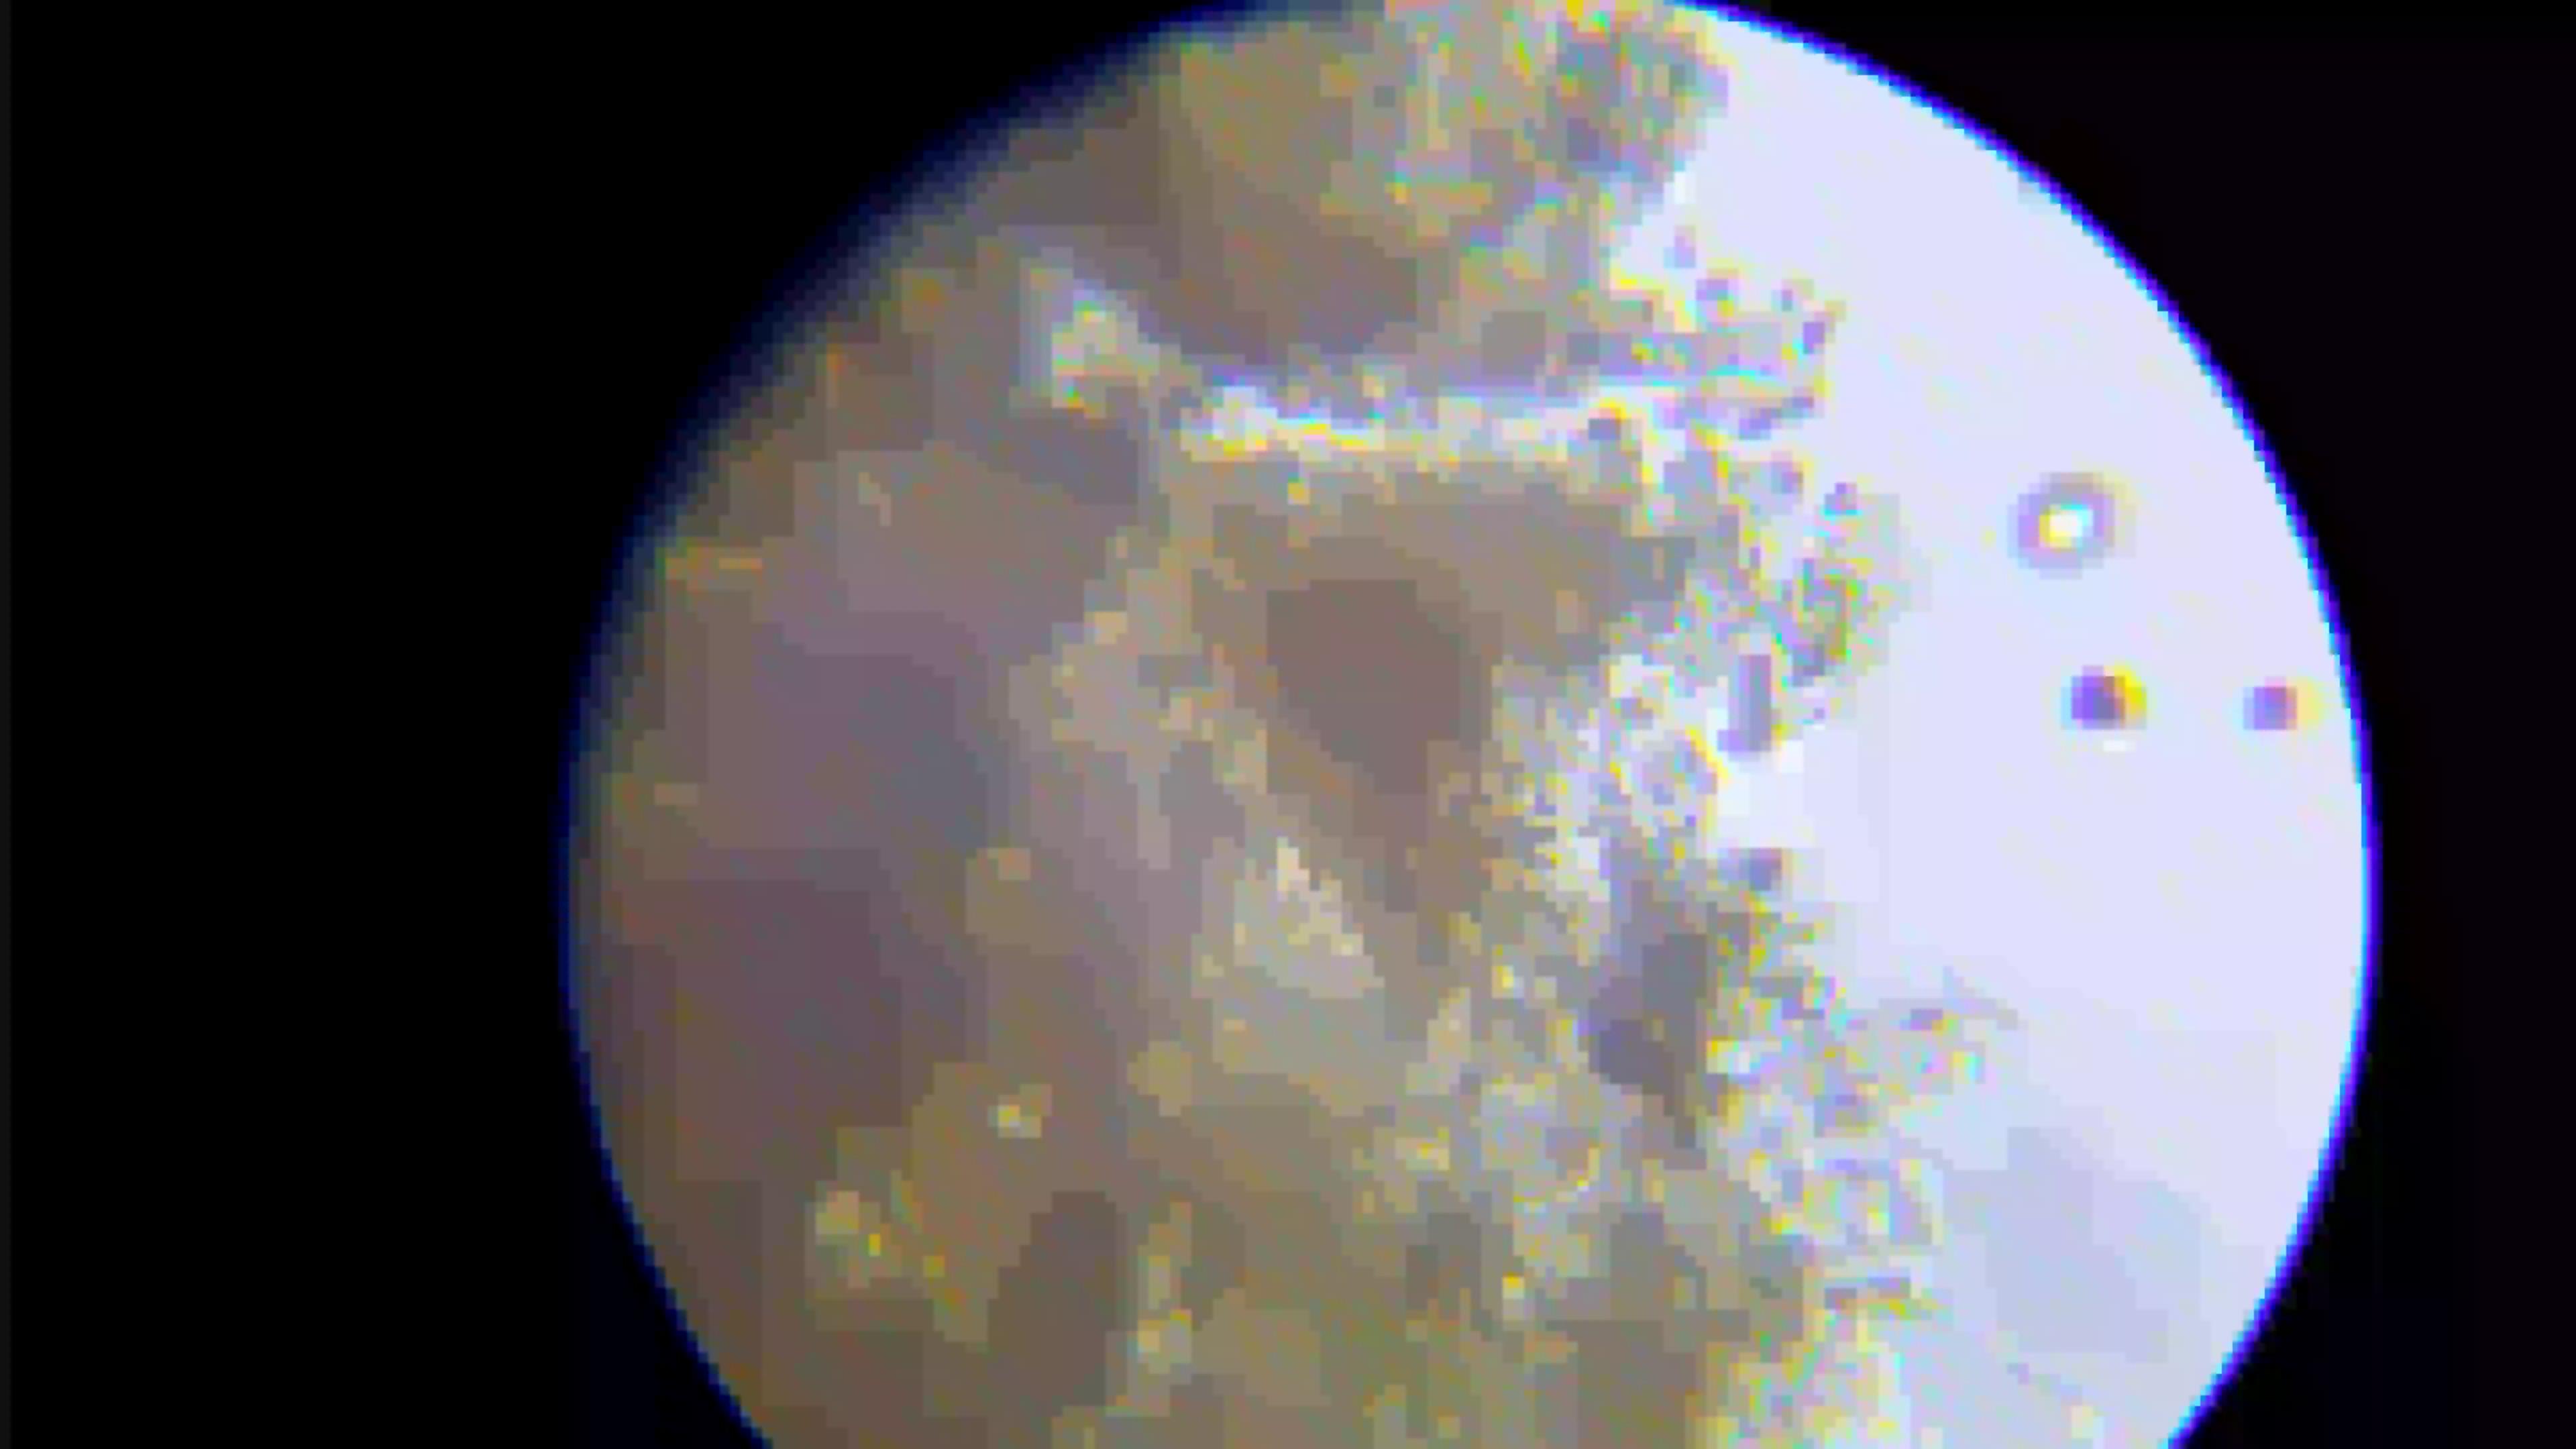 Mikroskop aufbau kinder dauerpräparate zum mikroskopieren